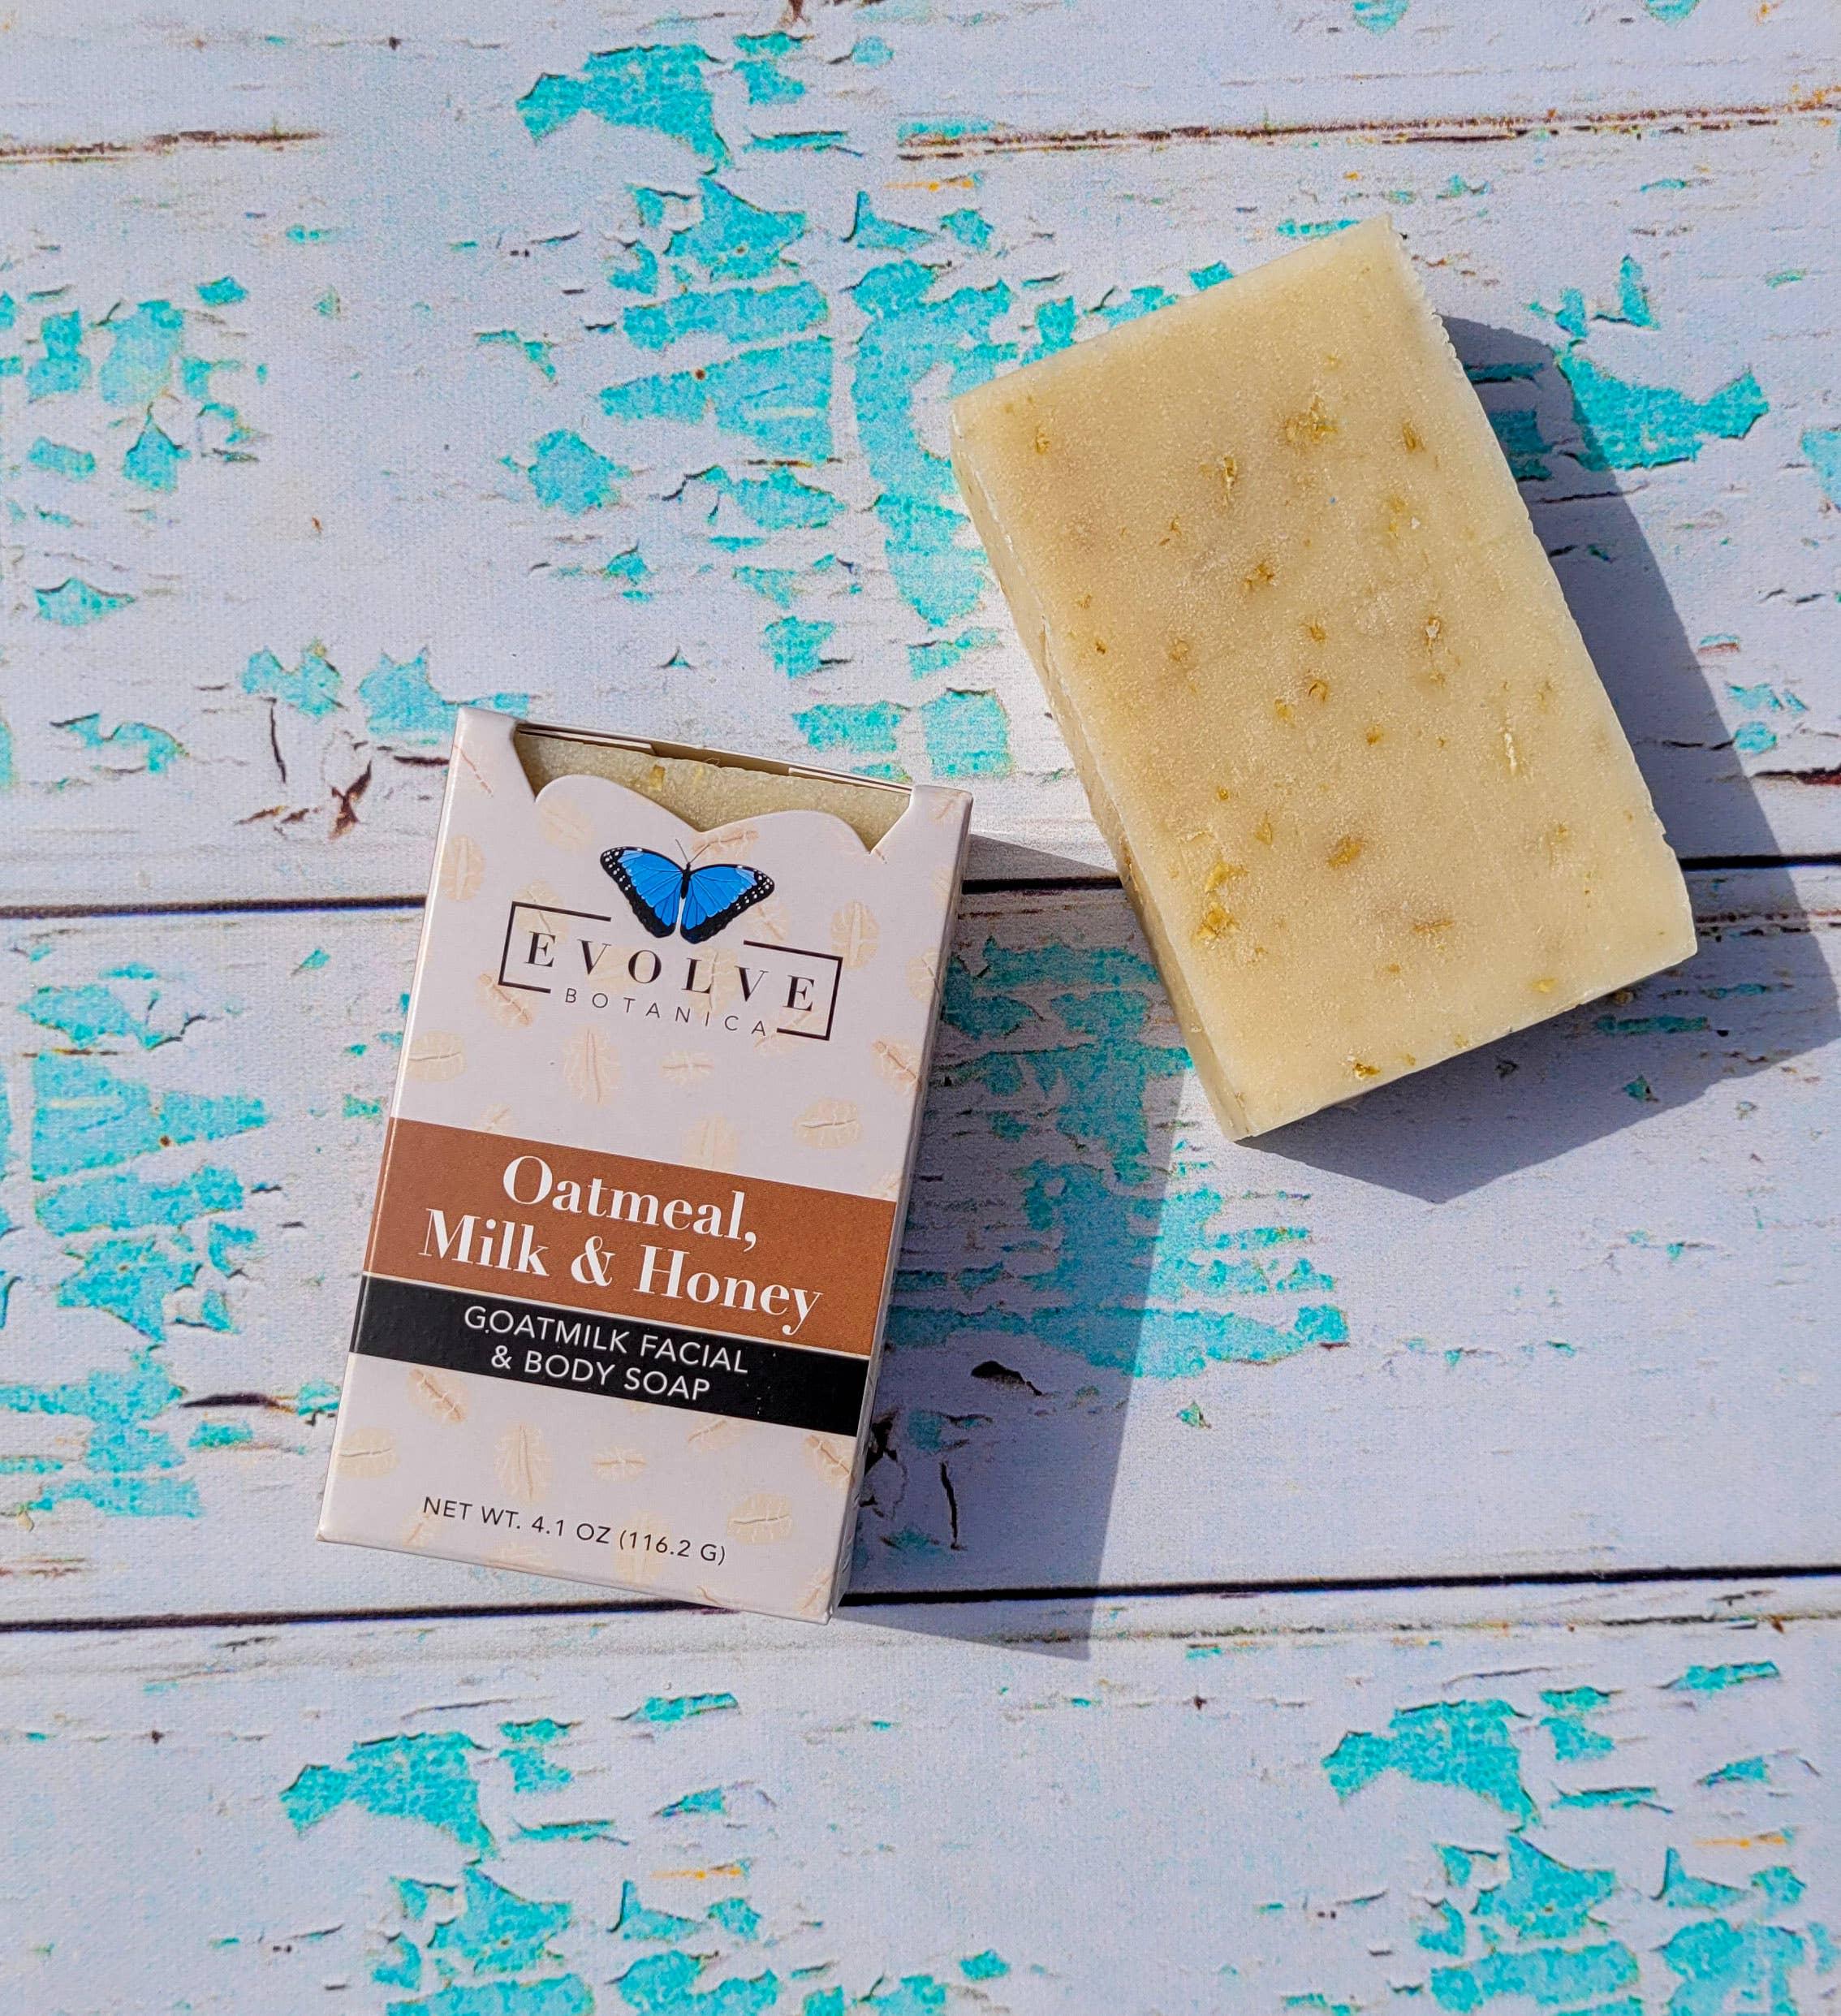 Evolve - Standard Soap - Oatmeal, Milk & Honey (Goatmilk) | Trada Marketplace